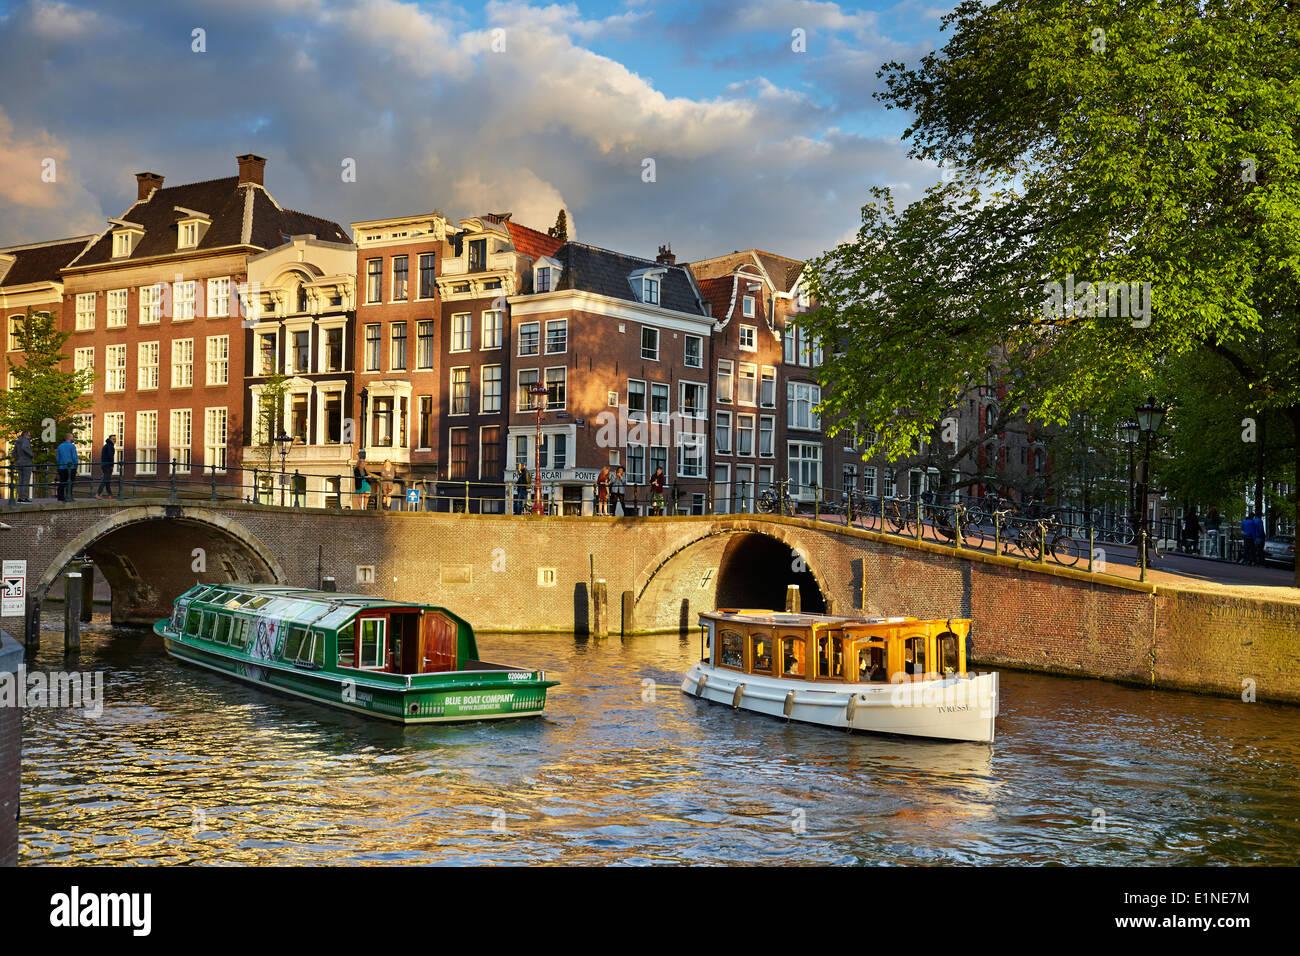 Touristenboot im Amsterdam Canal - Holland Niederlande Stockbild